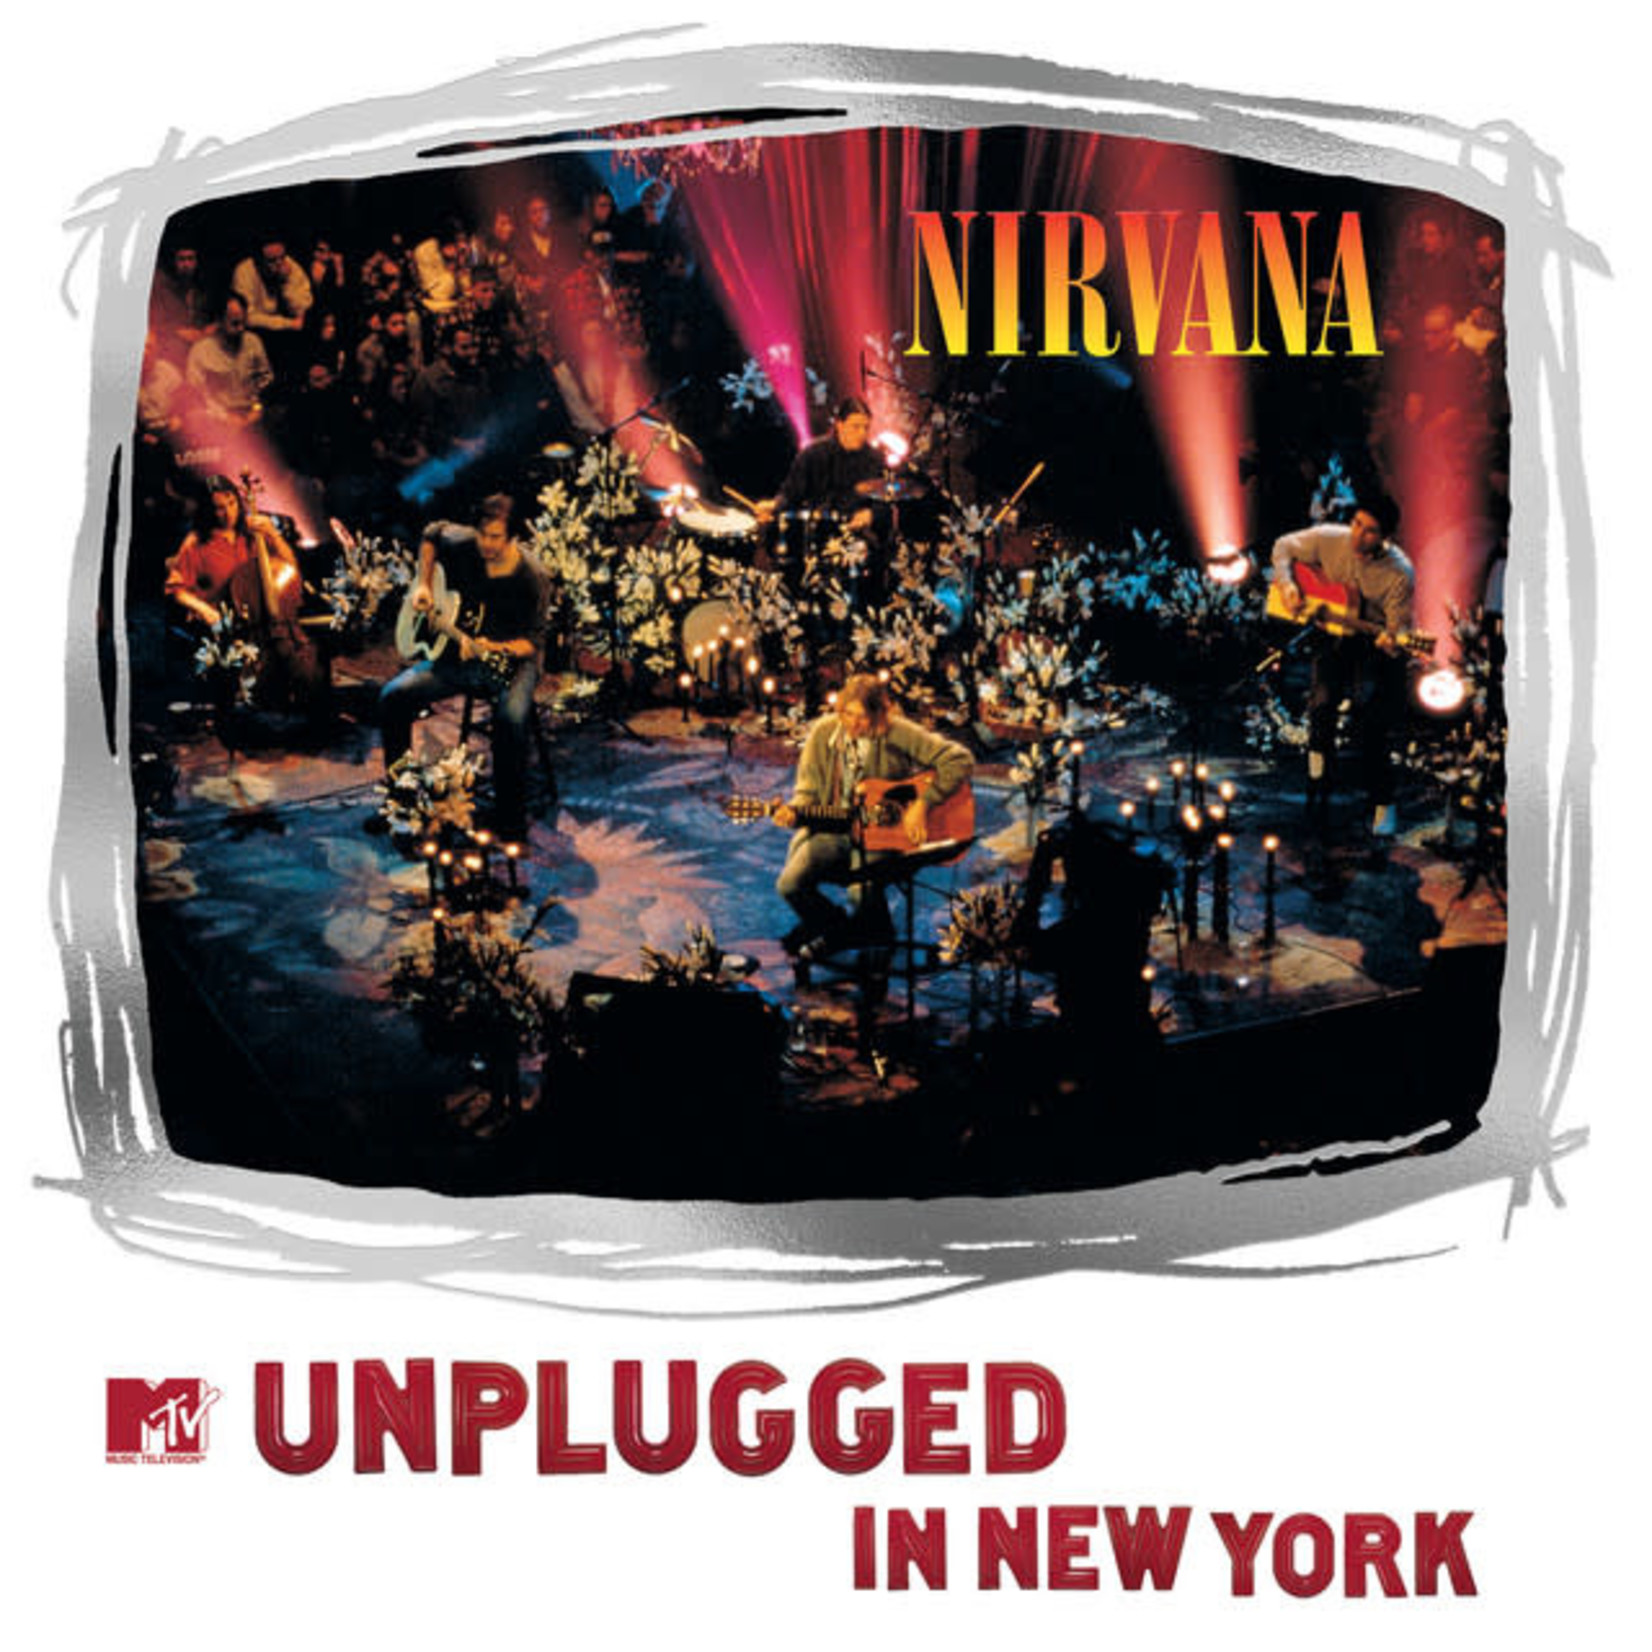 Vinyl Nirvana - Unplugged in New York (25th Anniversary)